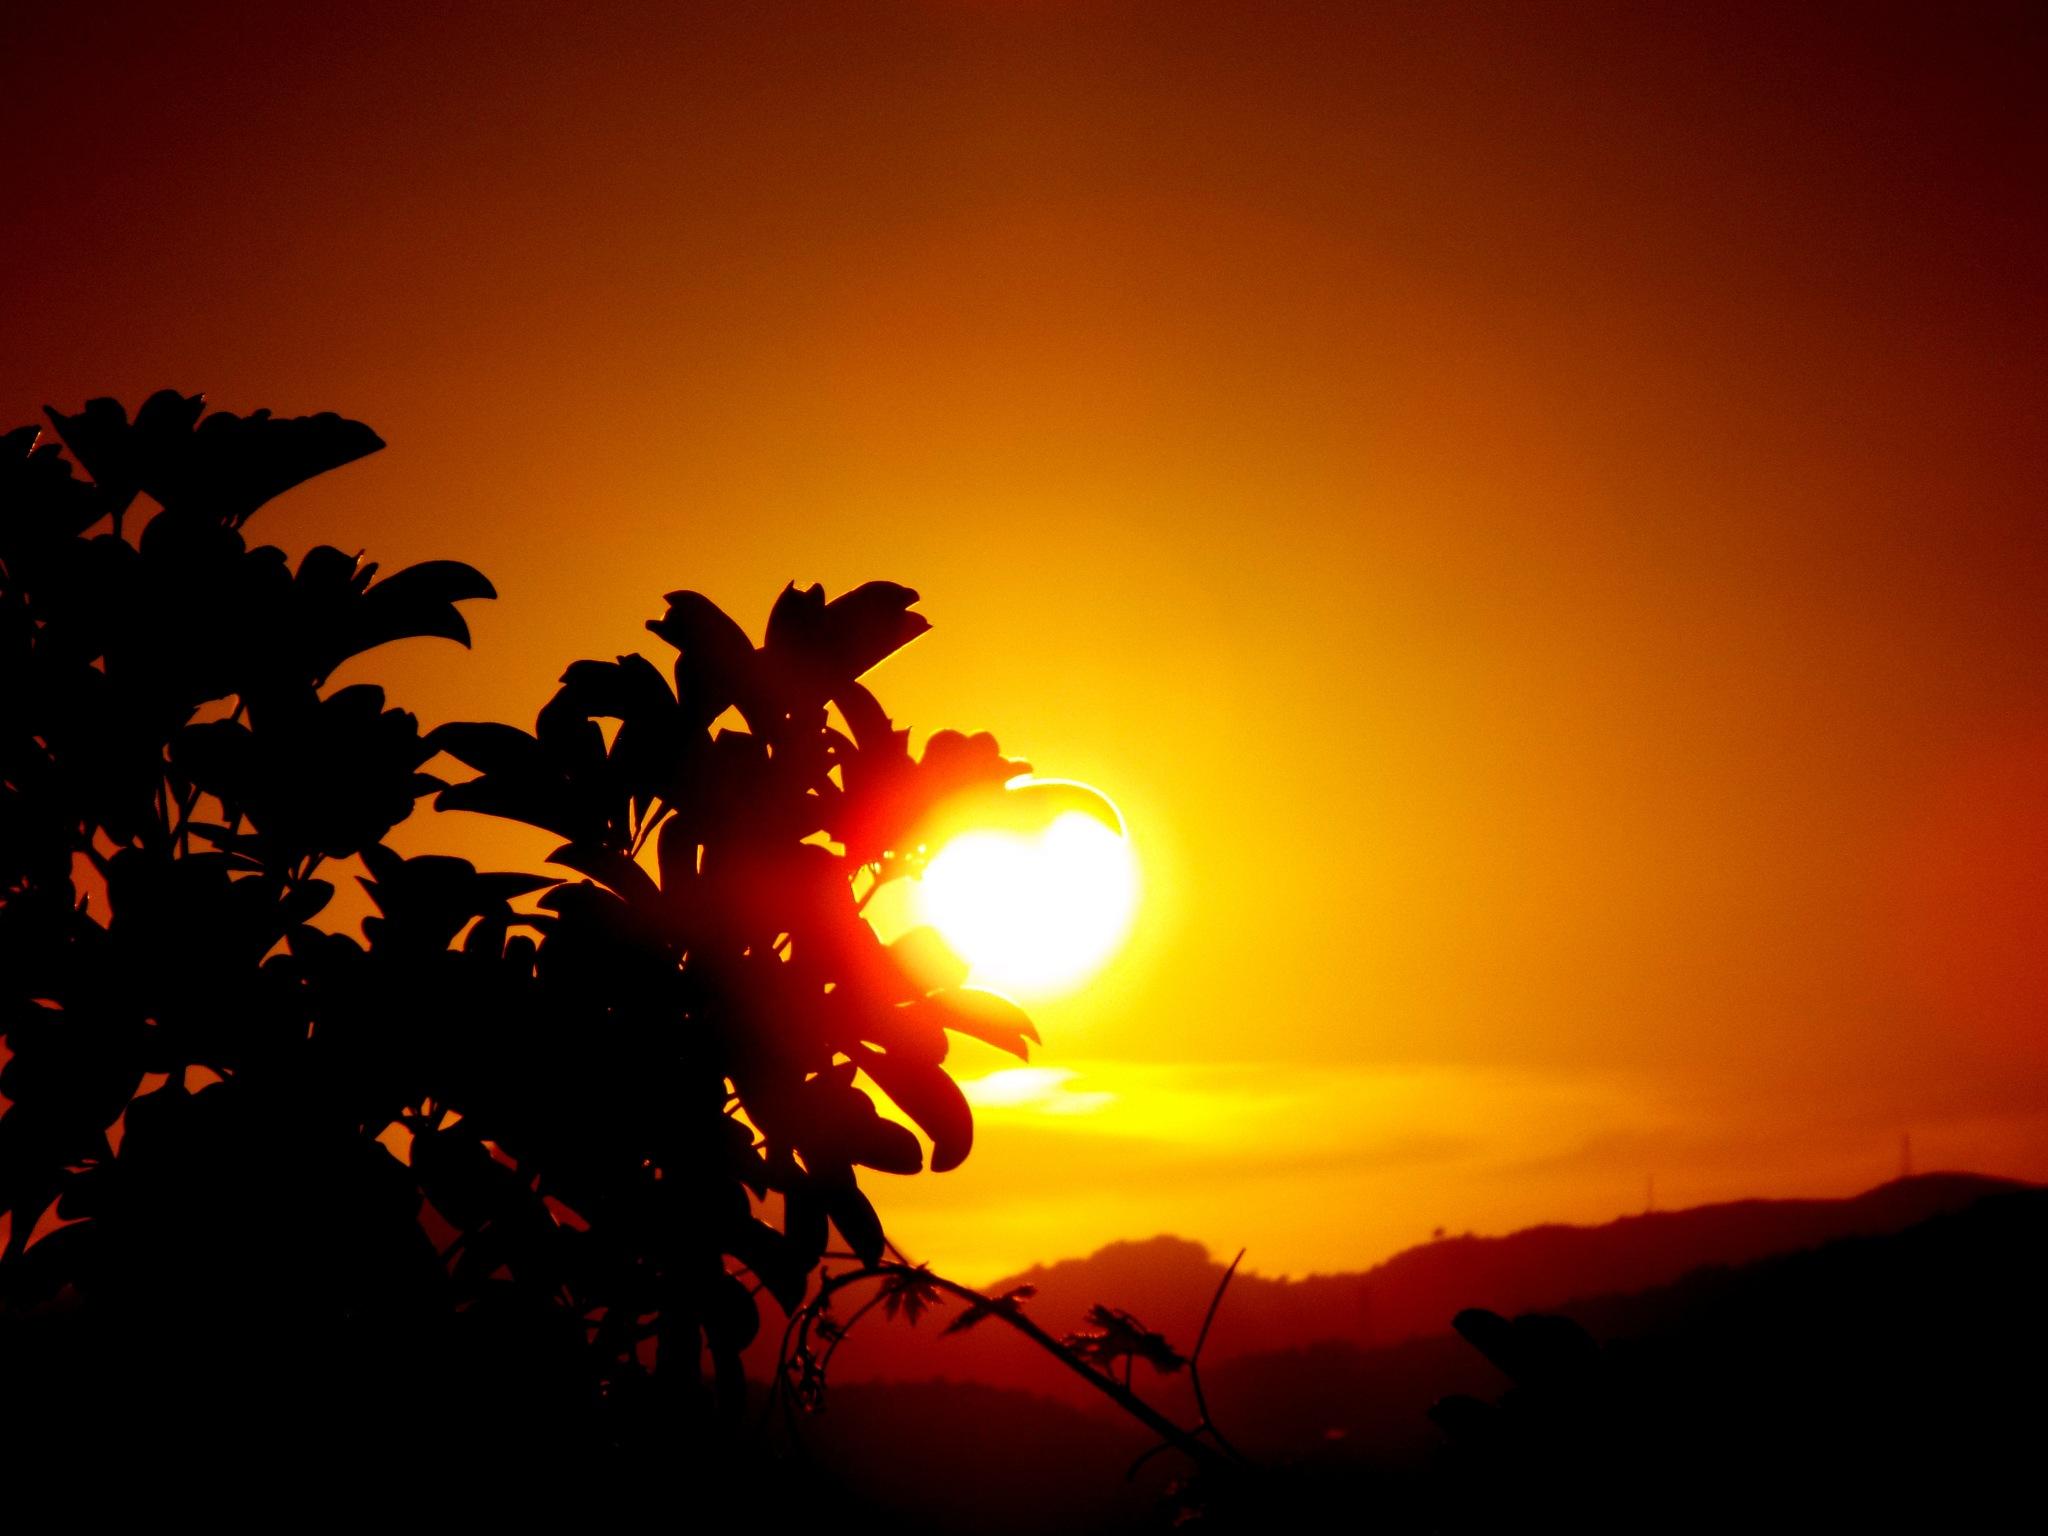 GRAPE  BUSH LEAVES CARESSING THE SUN by Akin Saner